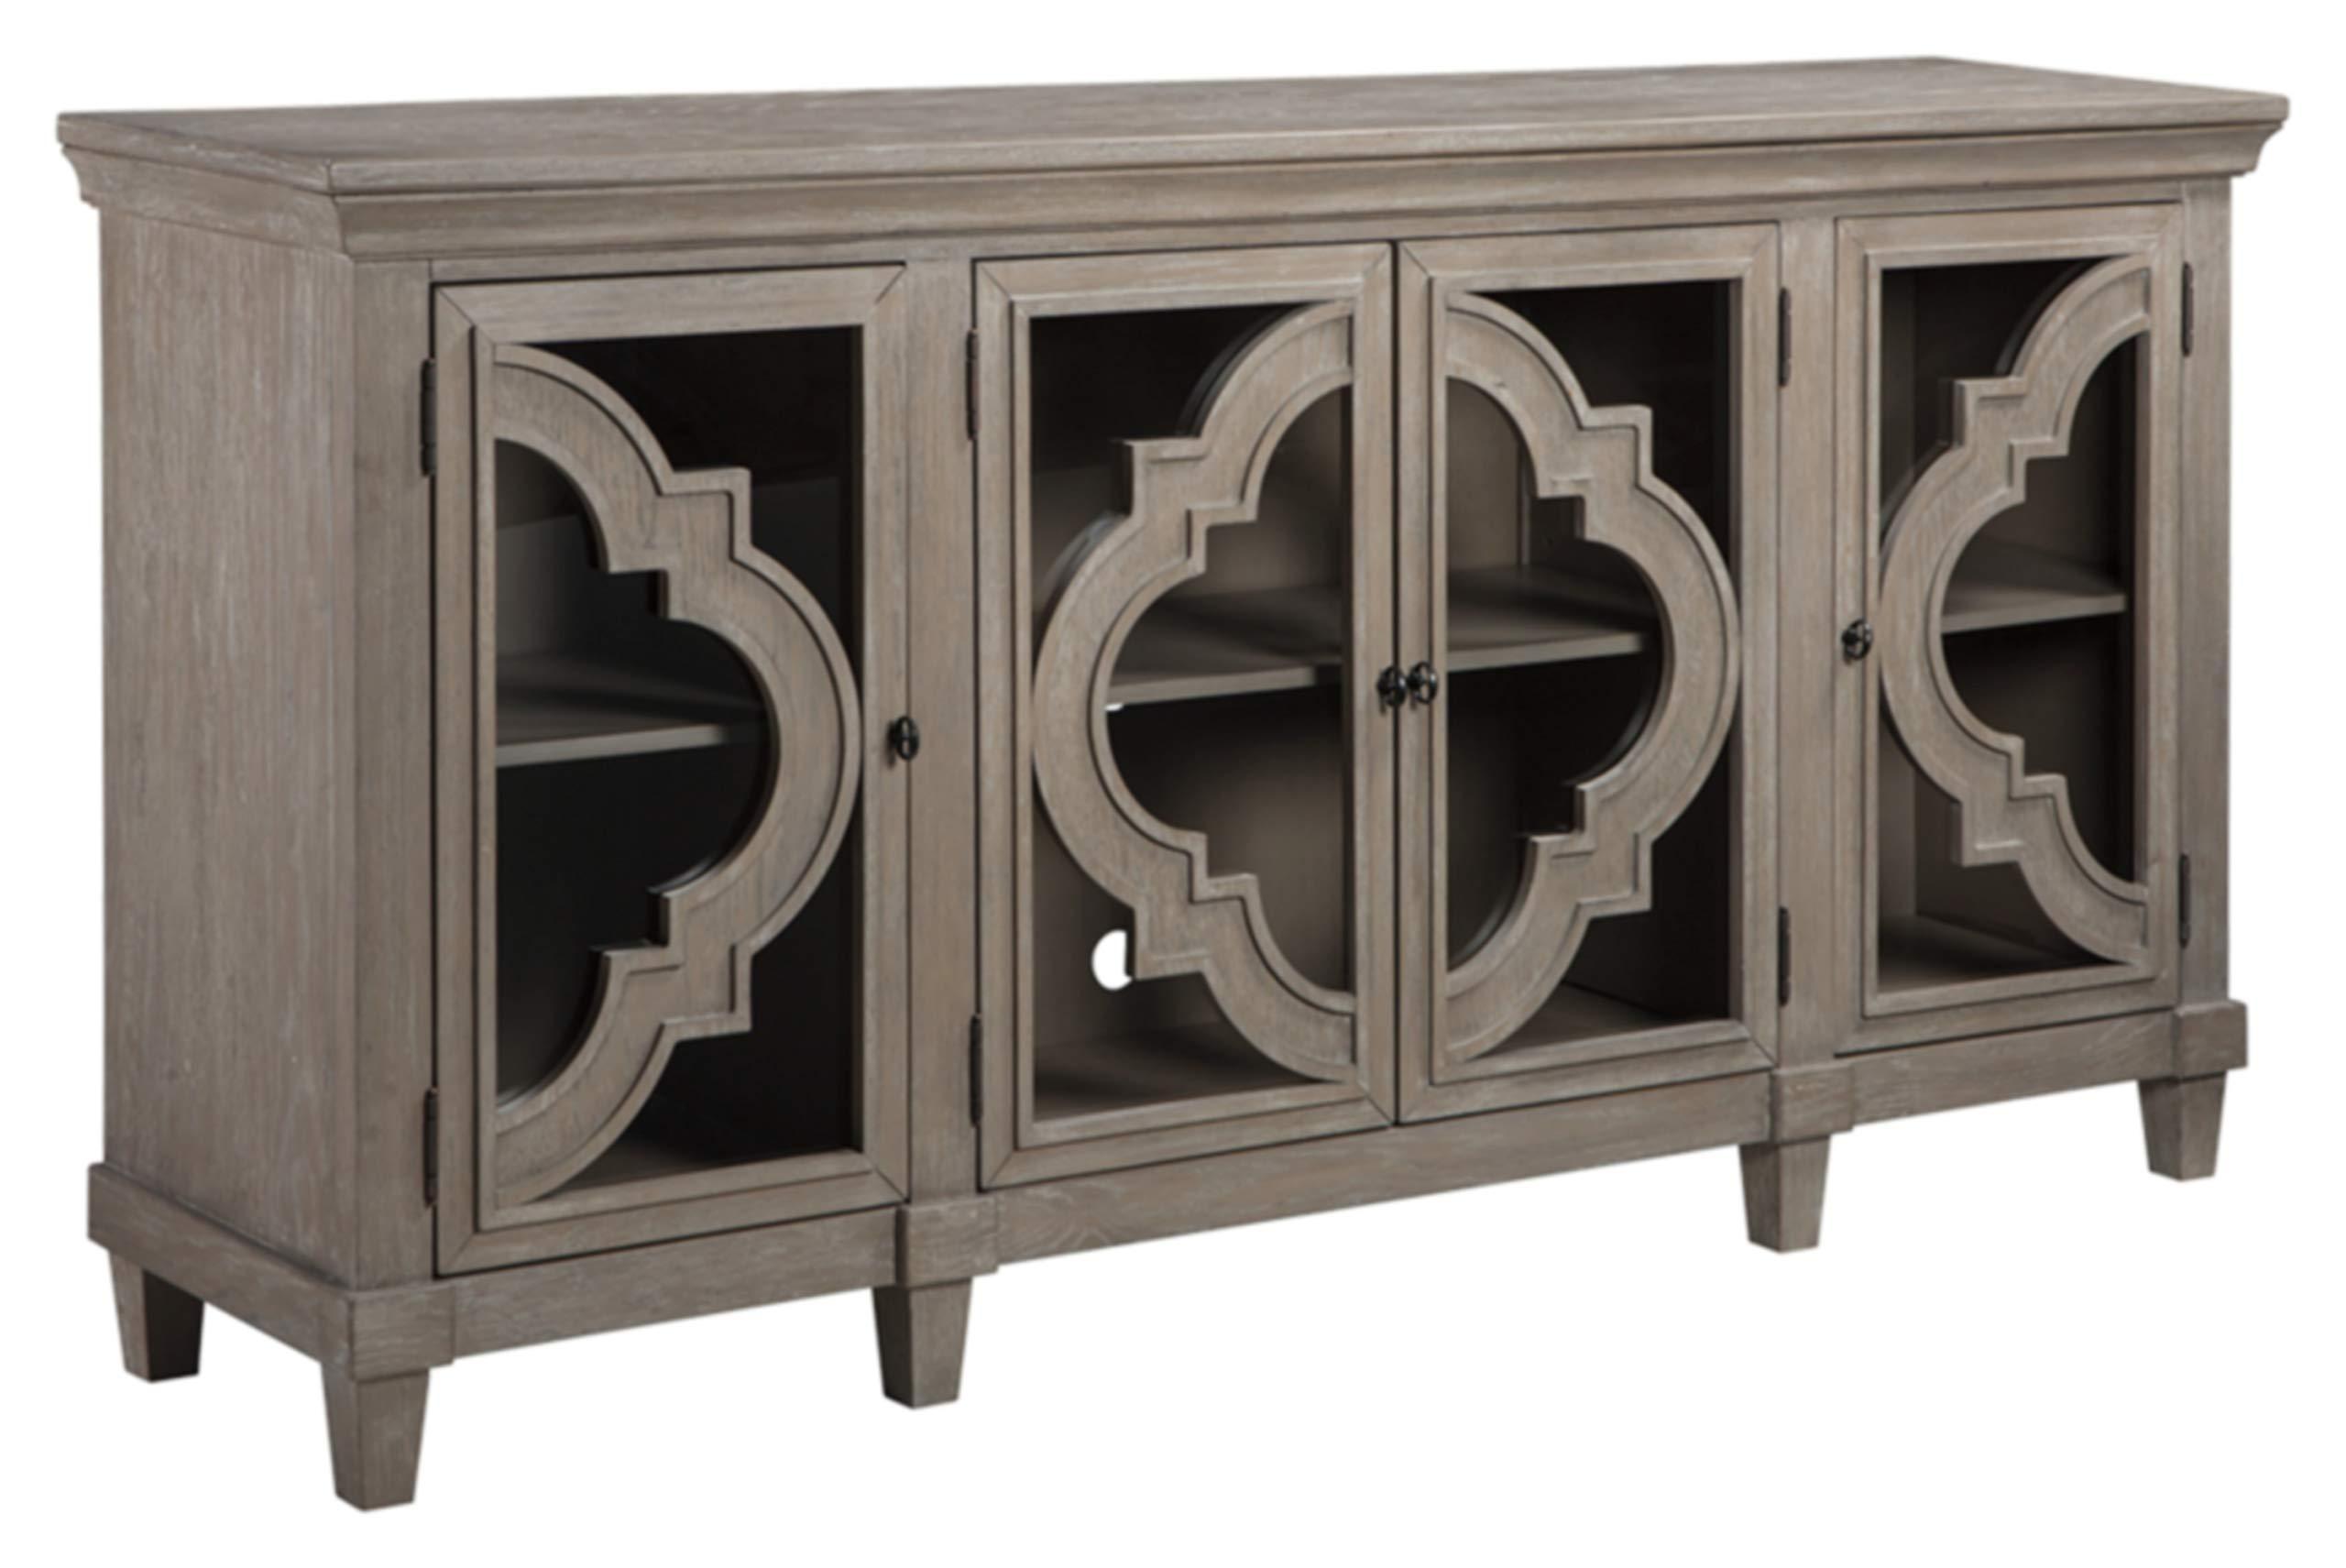 Ashley Furniture Signature Design - Fossil Ridge 4-Door Accent Cabinet - Gray Finish - Black Metal Hardware - Quatrefoil Pattern on Glass Panel Doors by Signature Design by Ashley